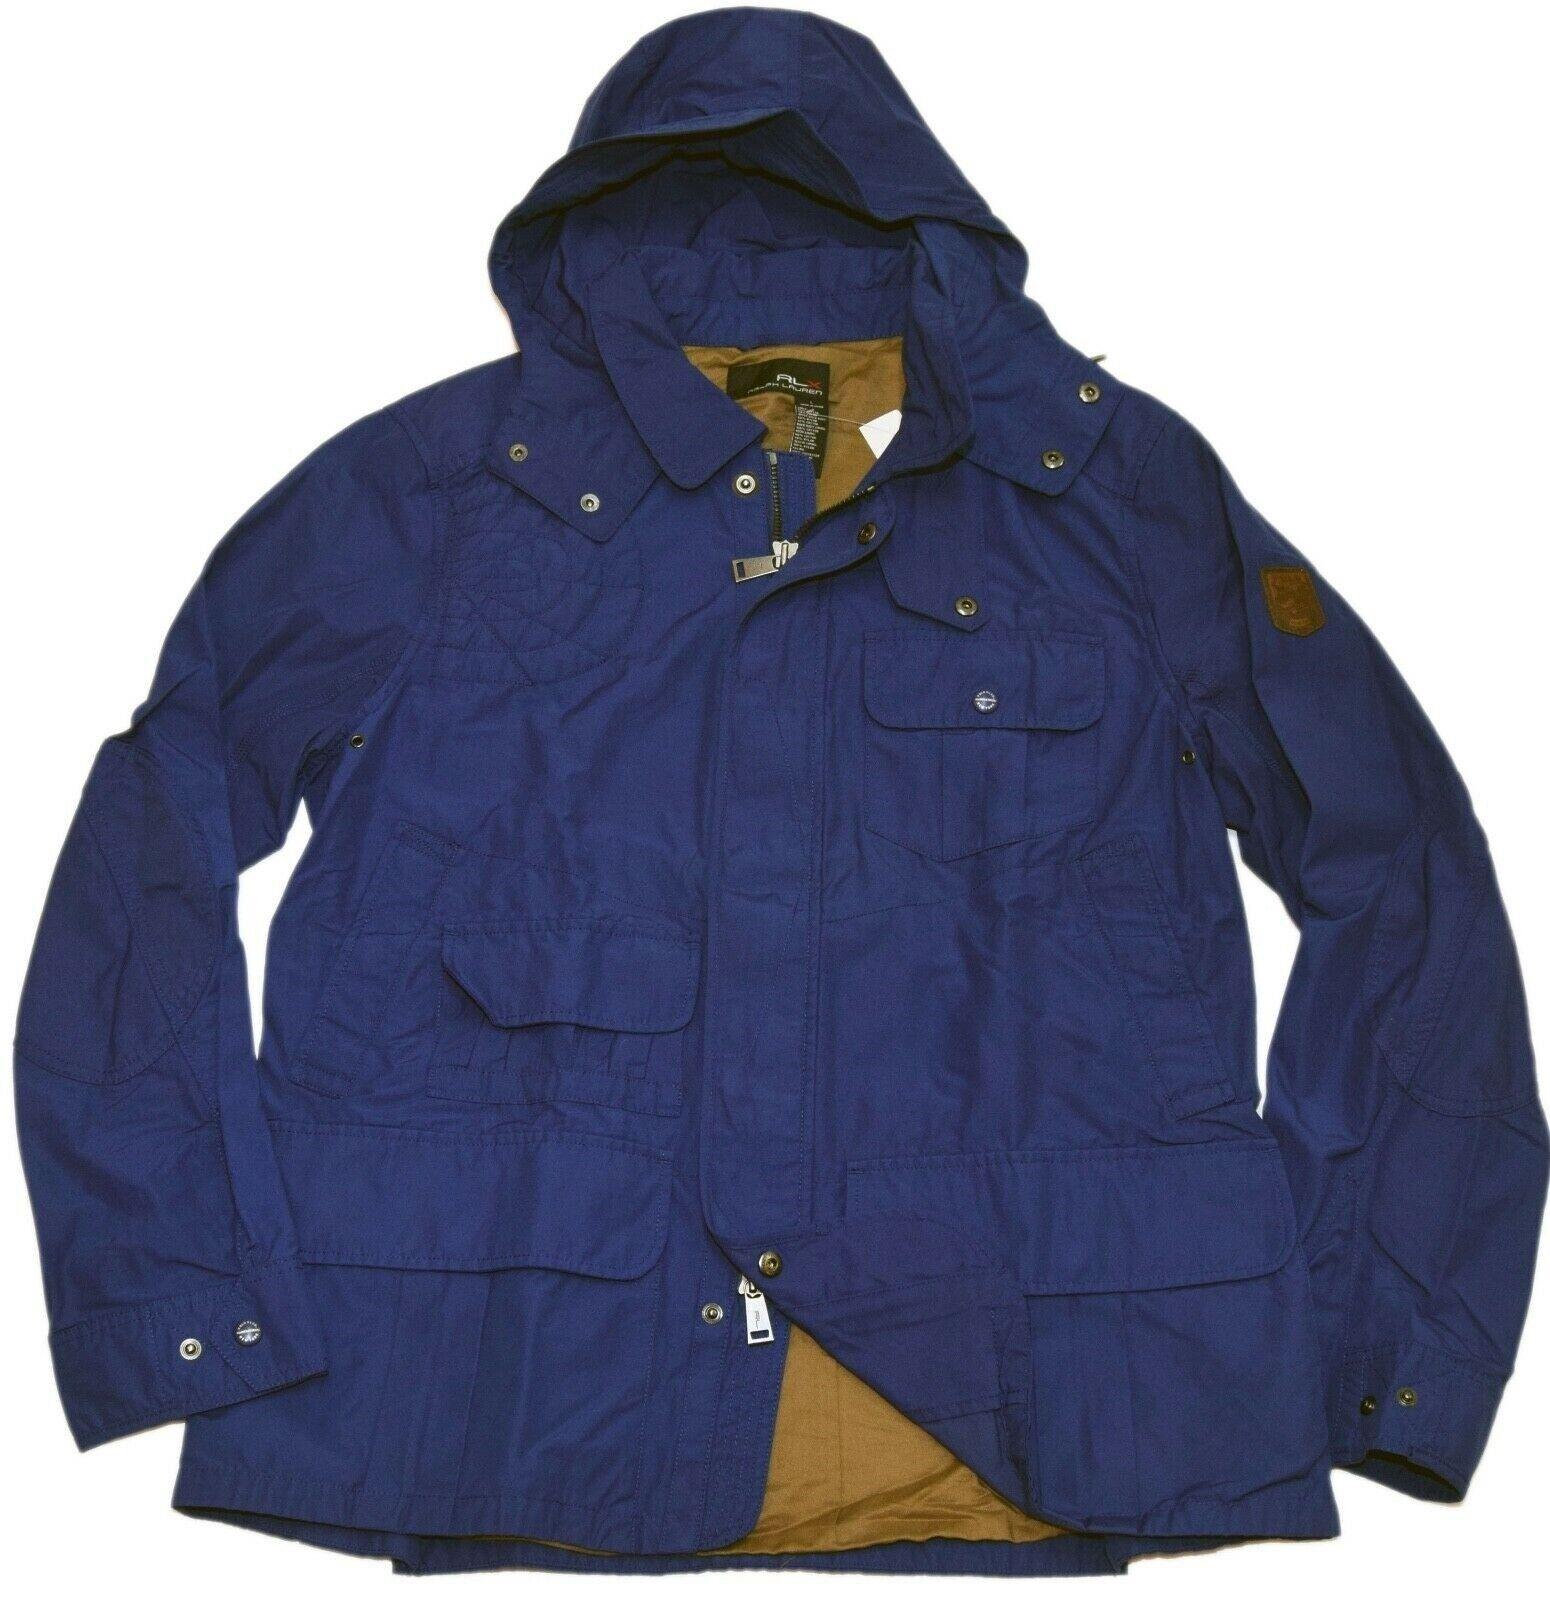 495-polo-ralph-lauren-rlx-mens-hooded-cargo-nylon-cotton-jacket-coat-blue-large